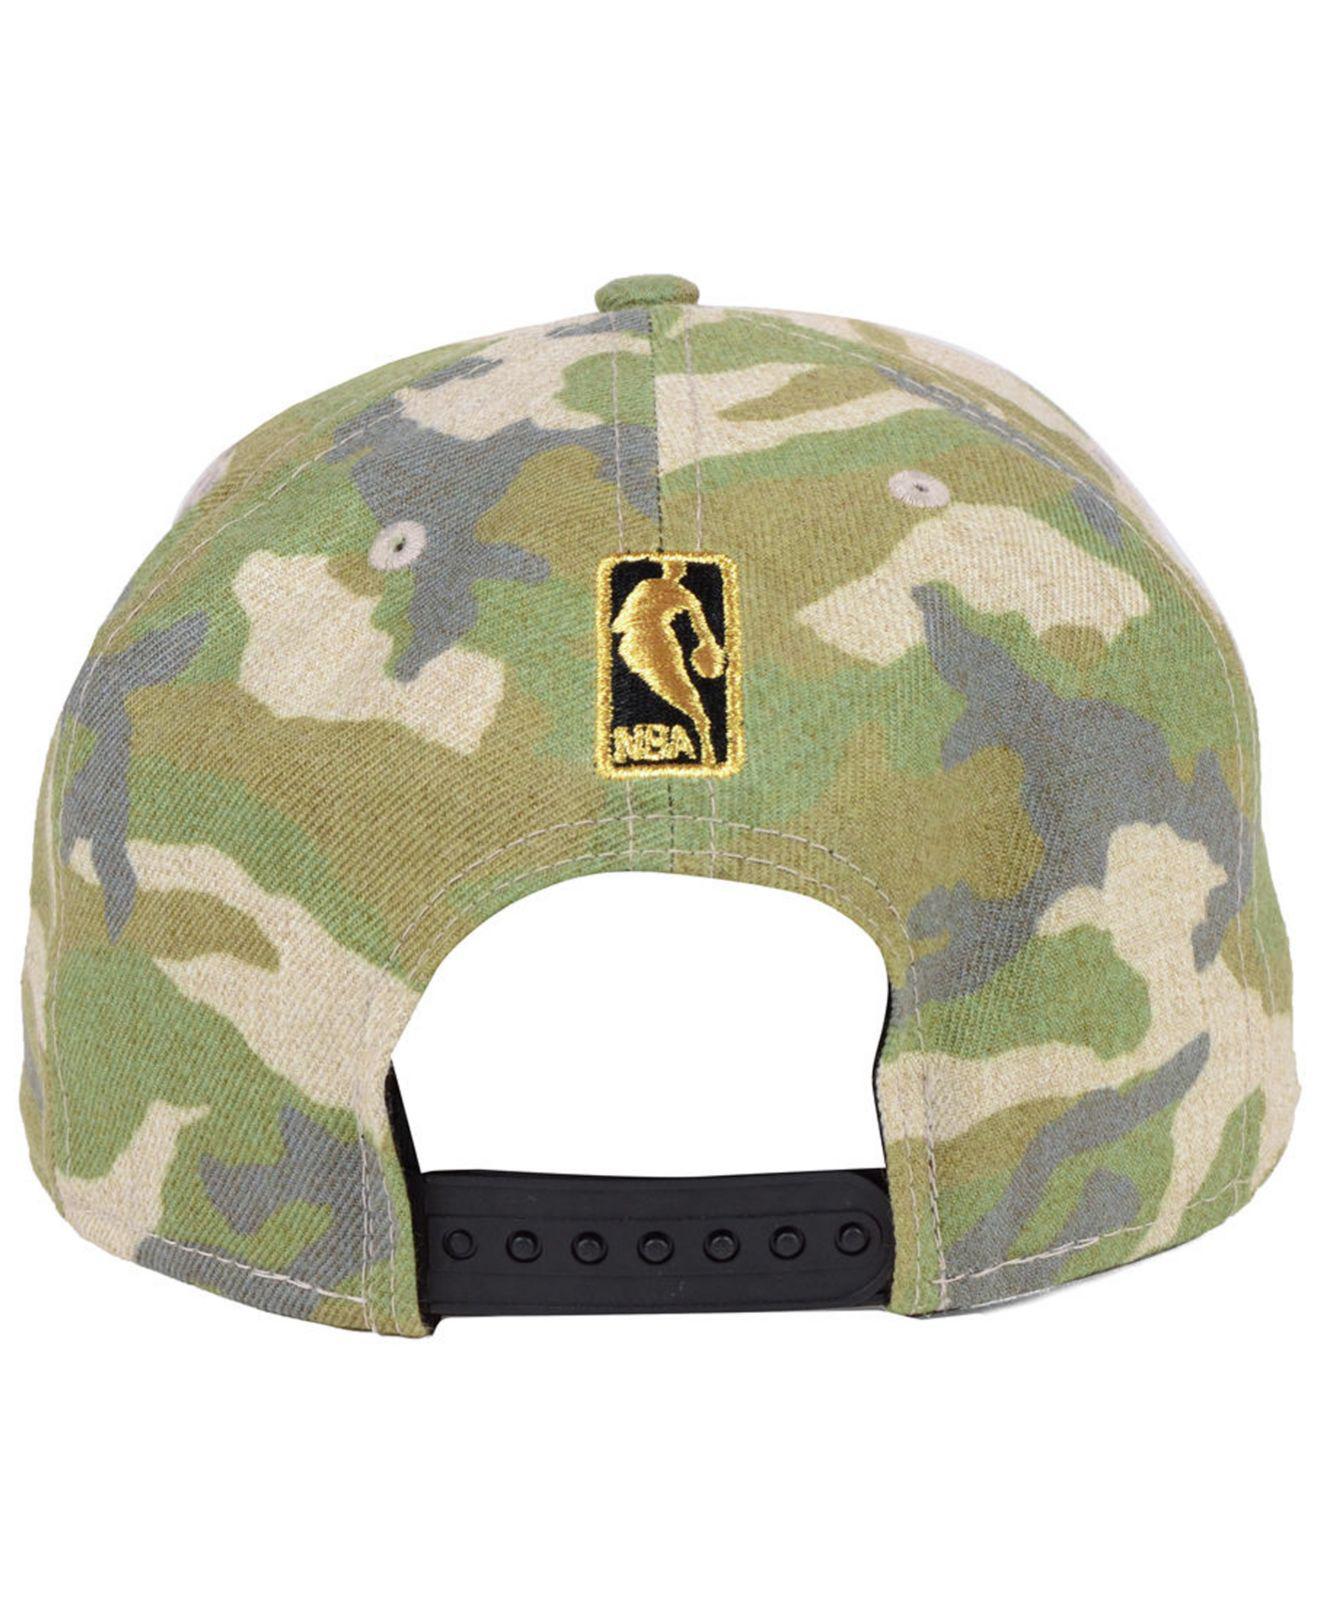 timeless design 62c5a a1565 coupon for ktz. mens green chicago bulls combo camo 9fifty snapback cap  0801c 8658b  clearance golden state warriors combo camo 9fifty snapback cap  for men ...